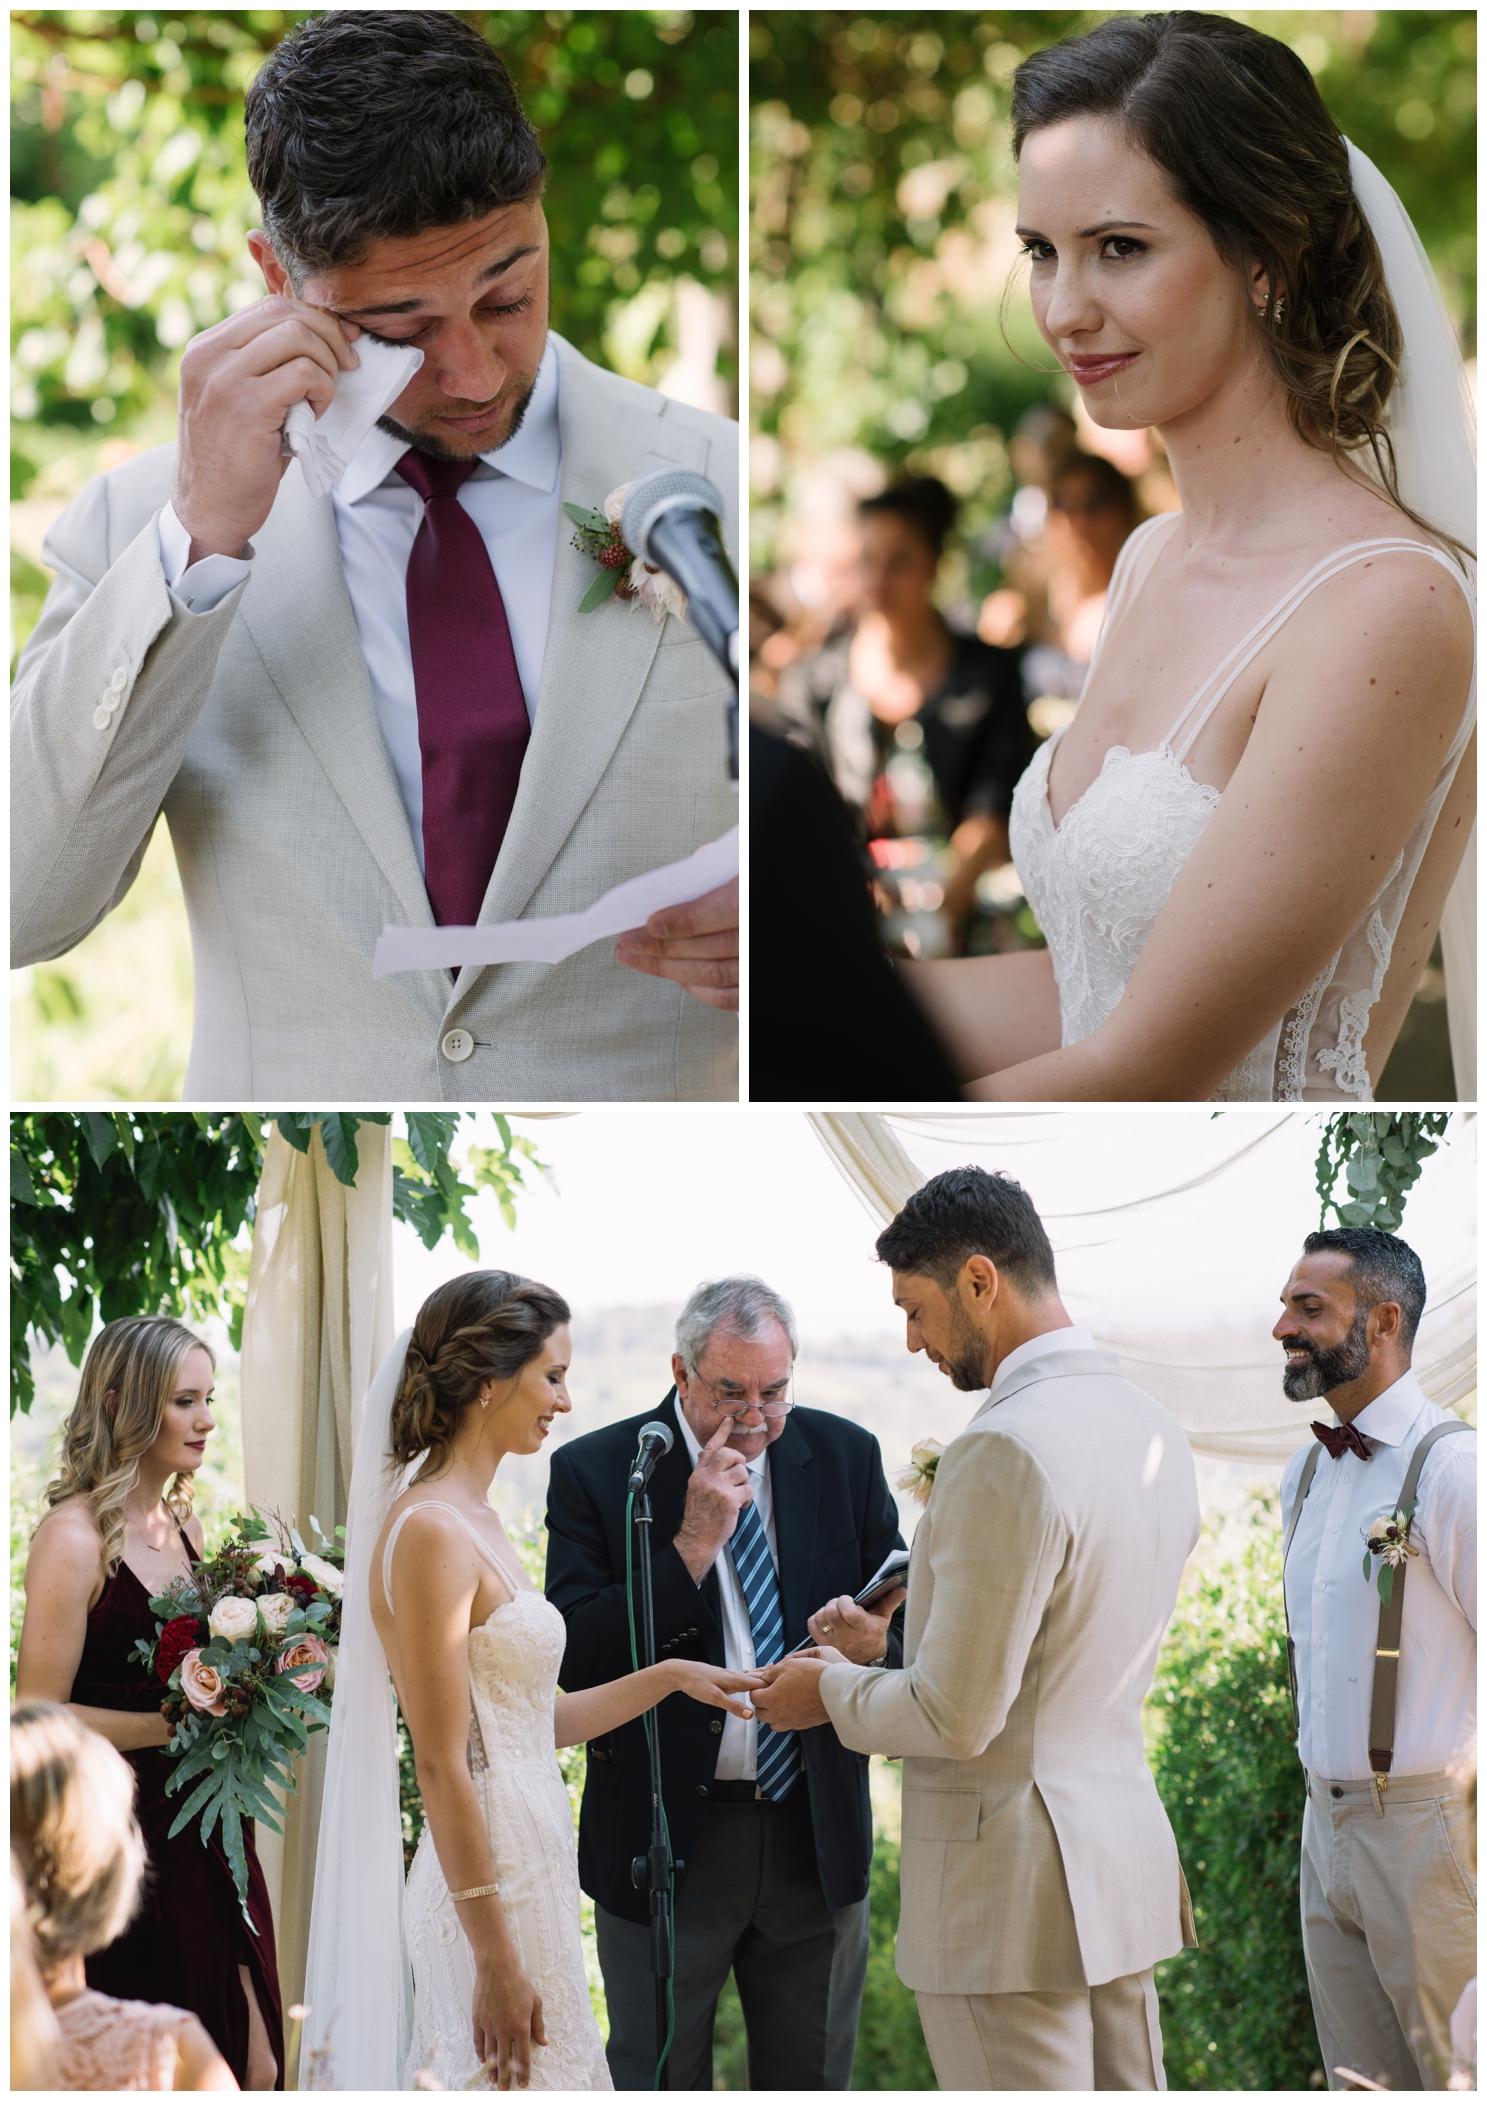 Wedding_Photographer_Tuscany_Italy_0019.jpg